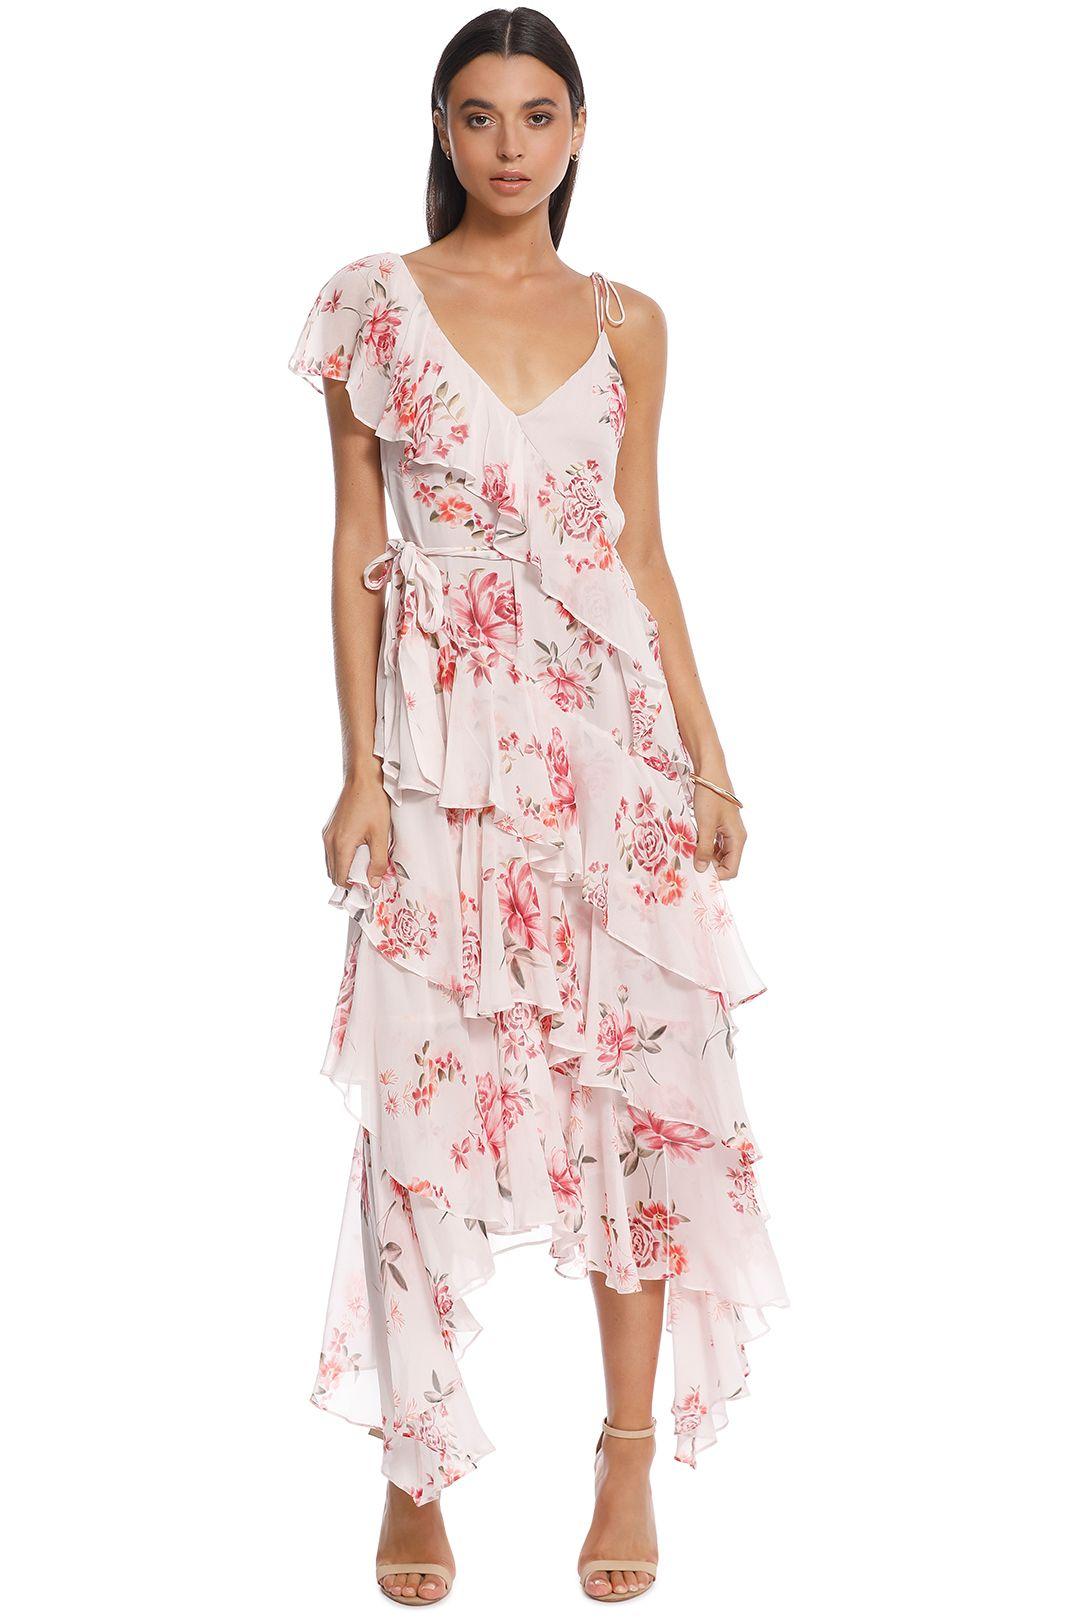 Lover - Blossom Midi Dress - Front